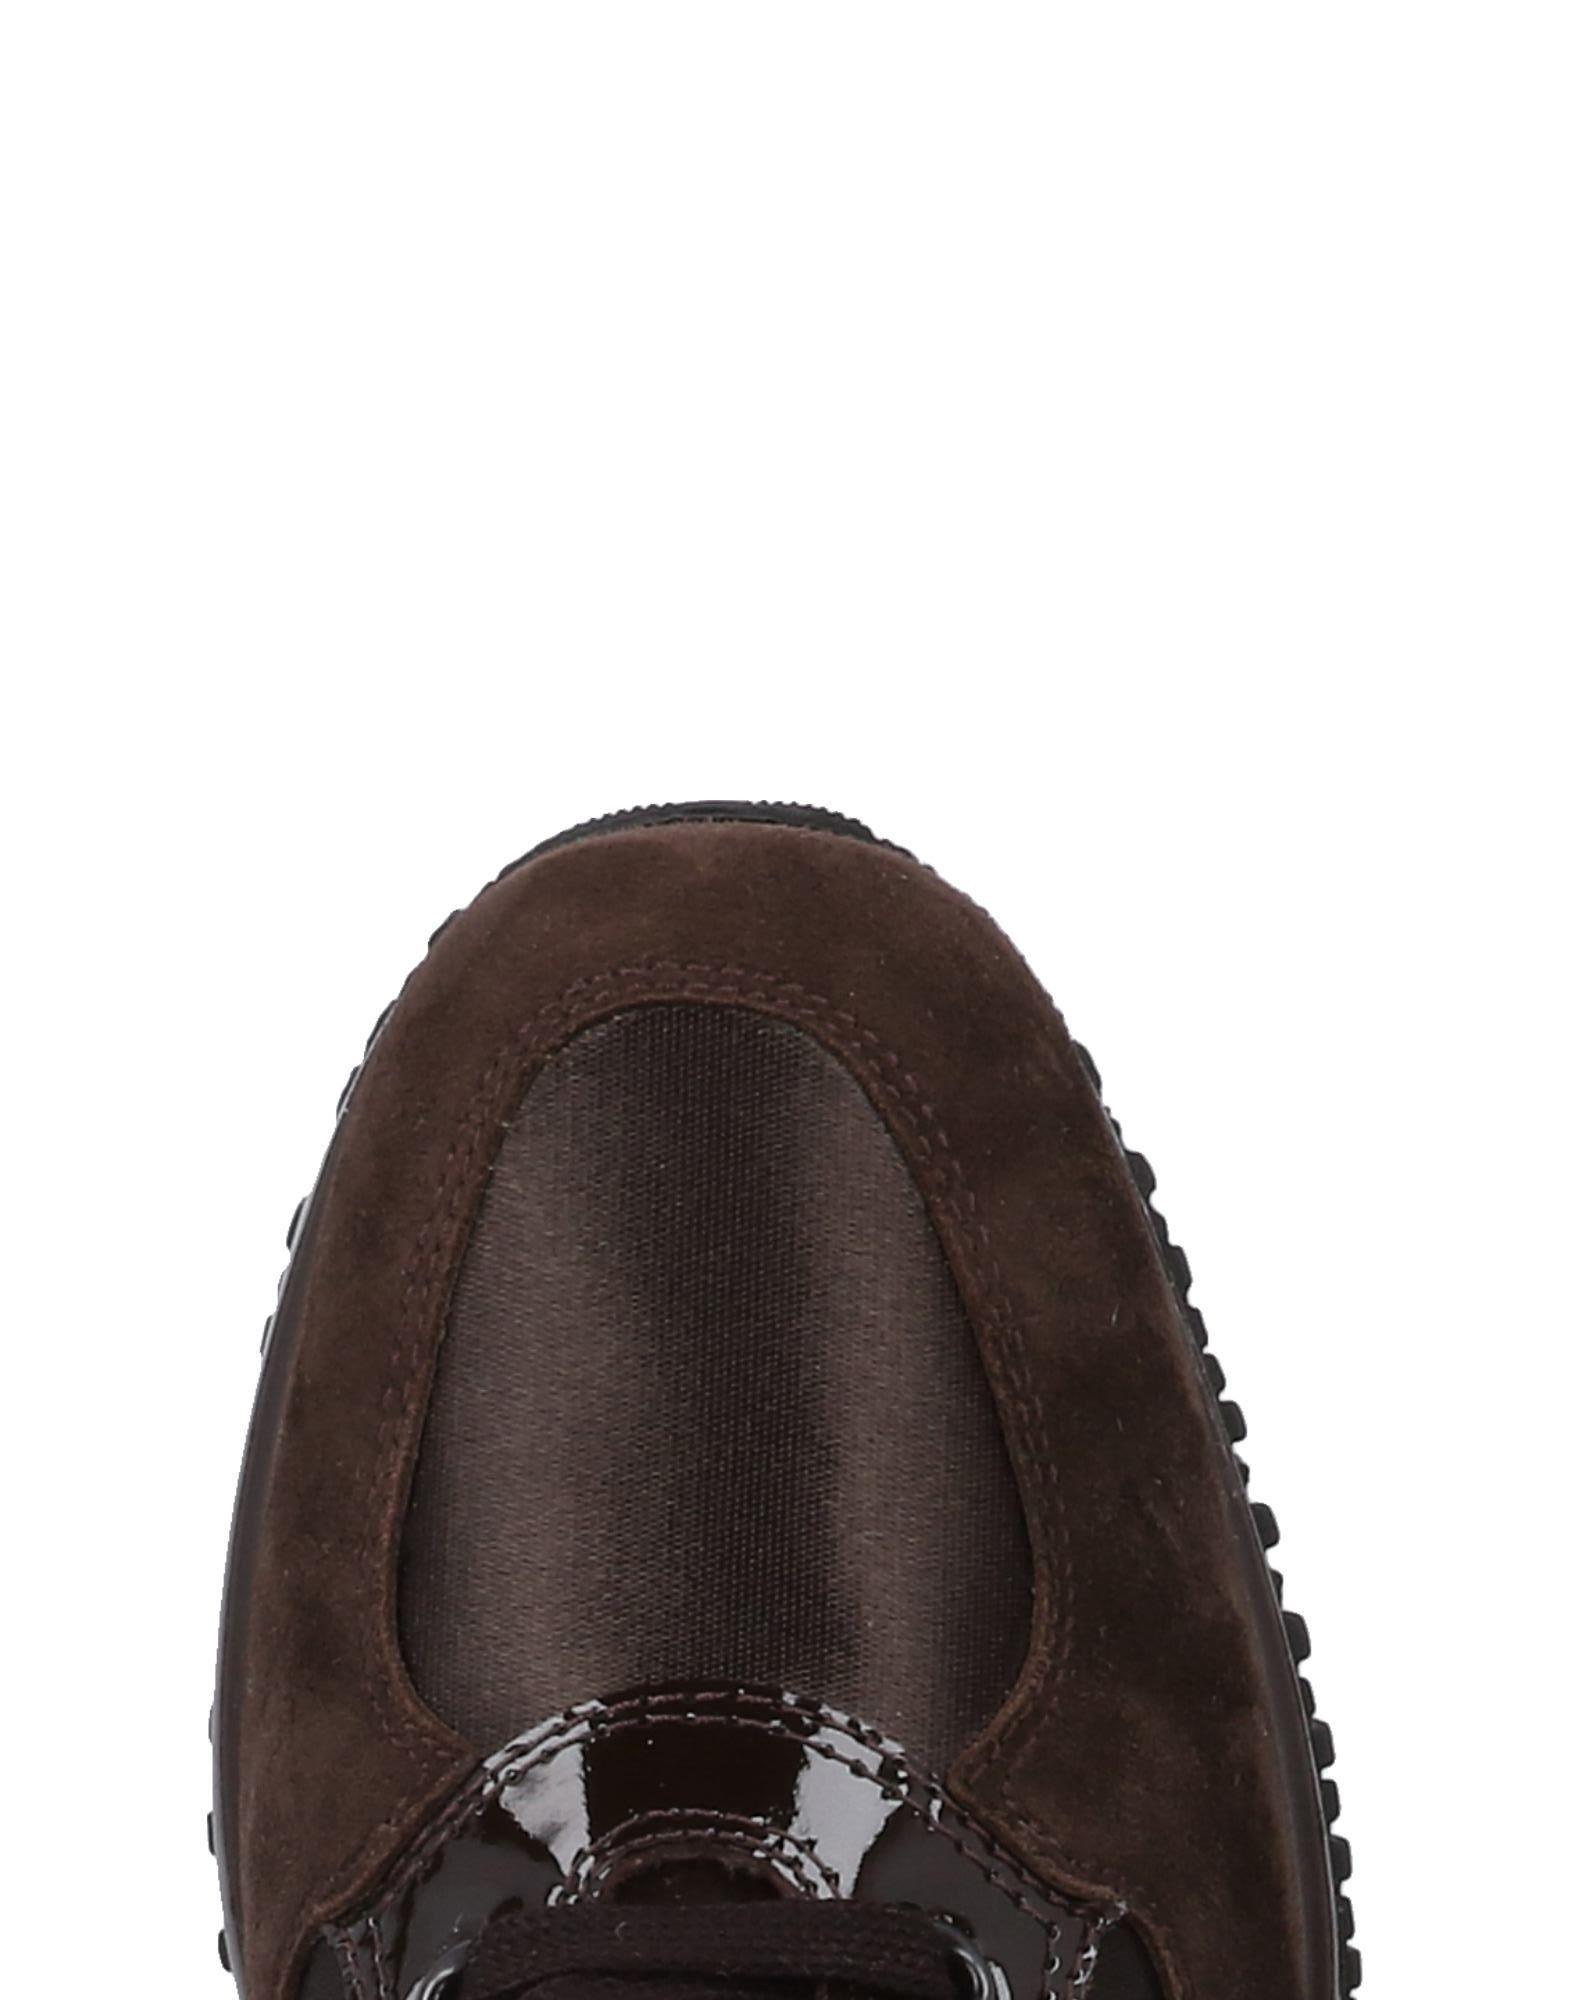 Hogan Hogan Hogan Sneakers - Women Hogan Sneakers online on  United Kingdom - 11489272EU 6e1420